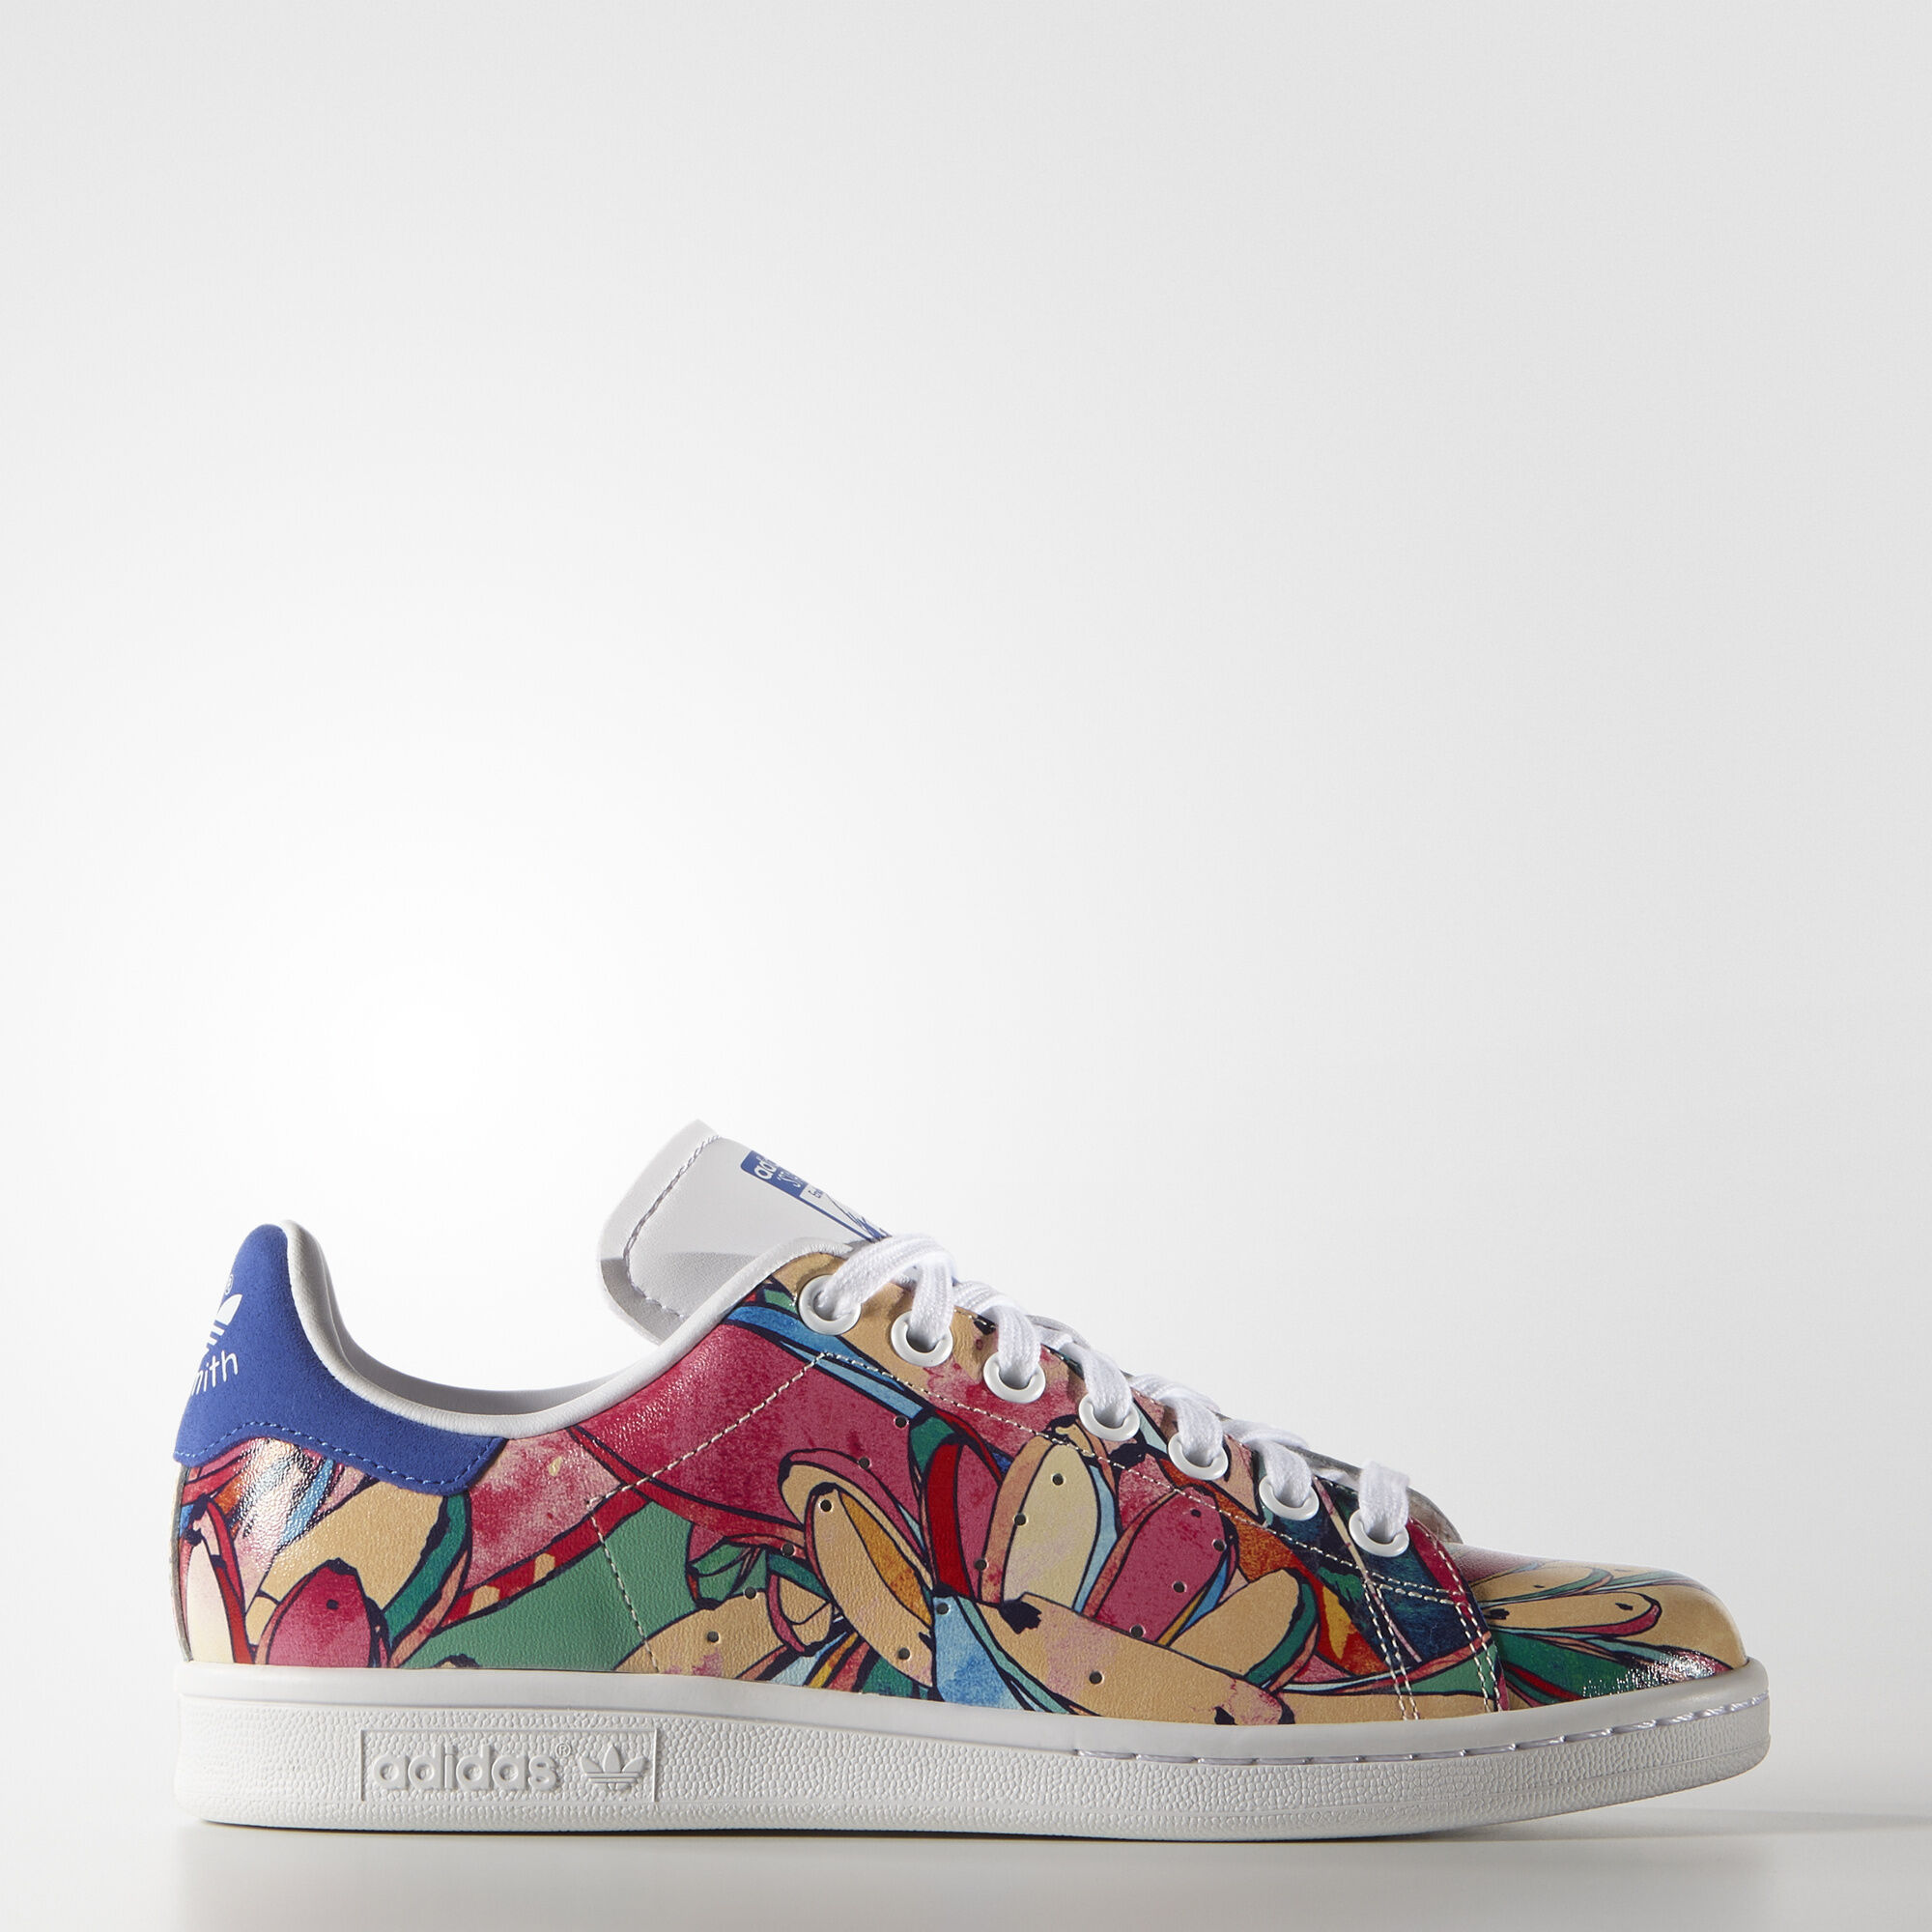 adidas shoes company